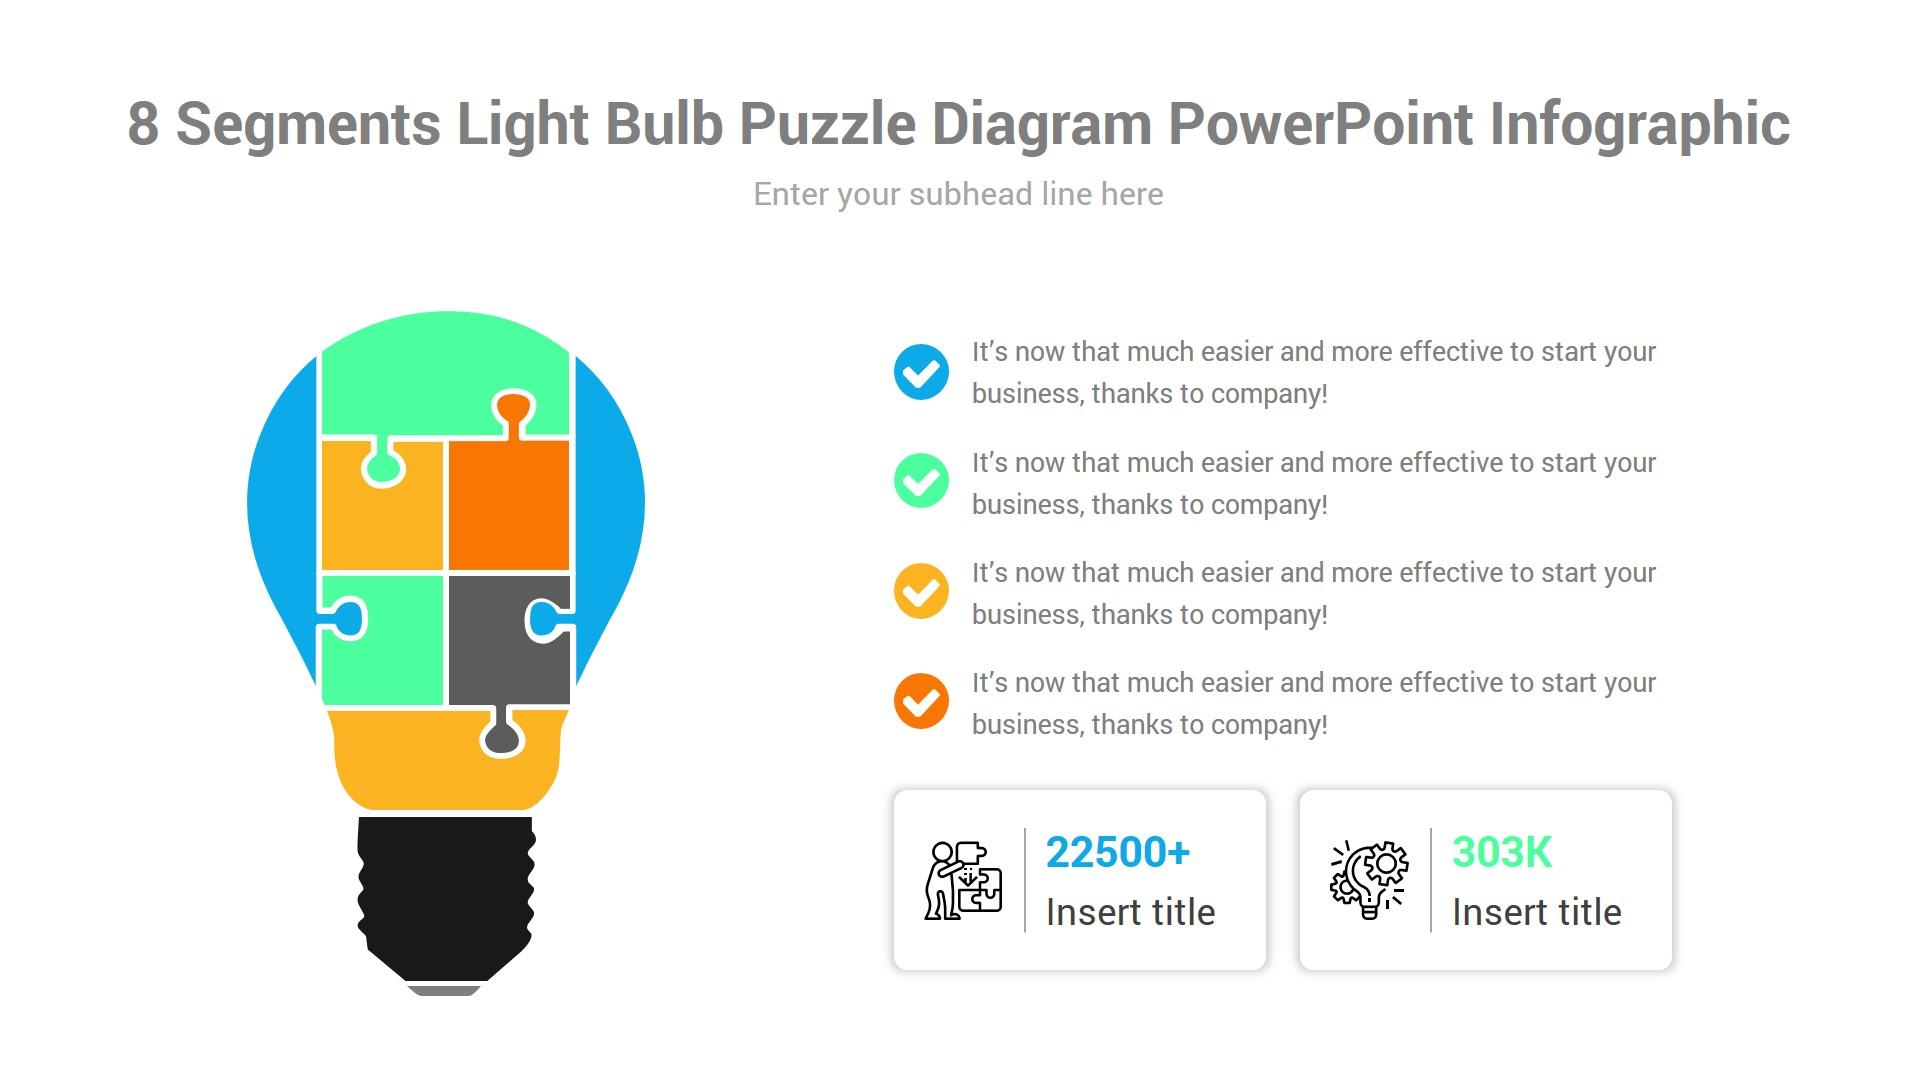 8 Segments Light Bulb Puzzle Diagram PowerPoint Infographic